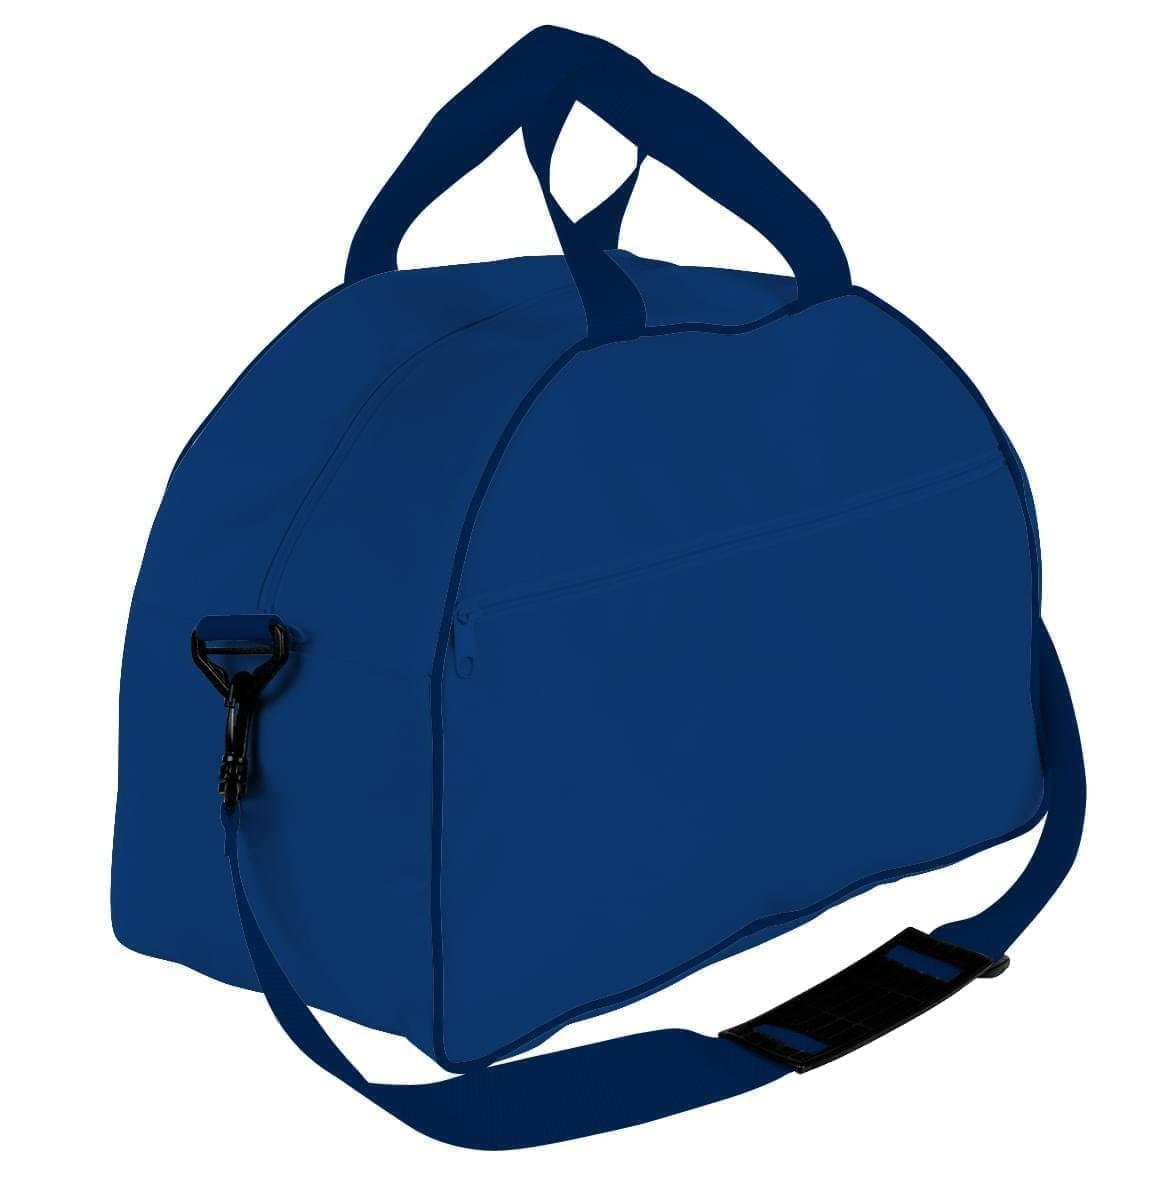 USA Made Nylon Poly Weekender Duffel Bags, Royal Blue-Navy, 6PKV32JA0Z